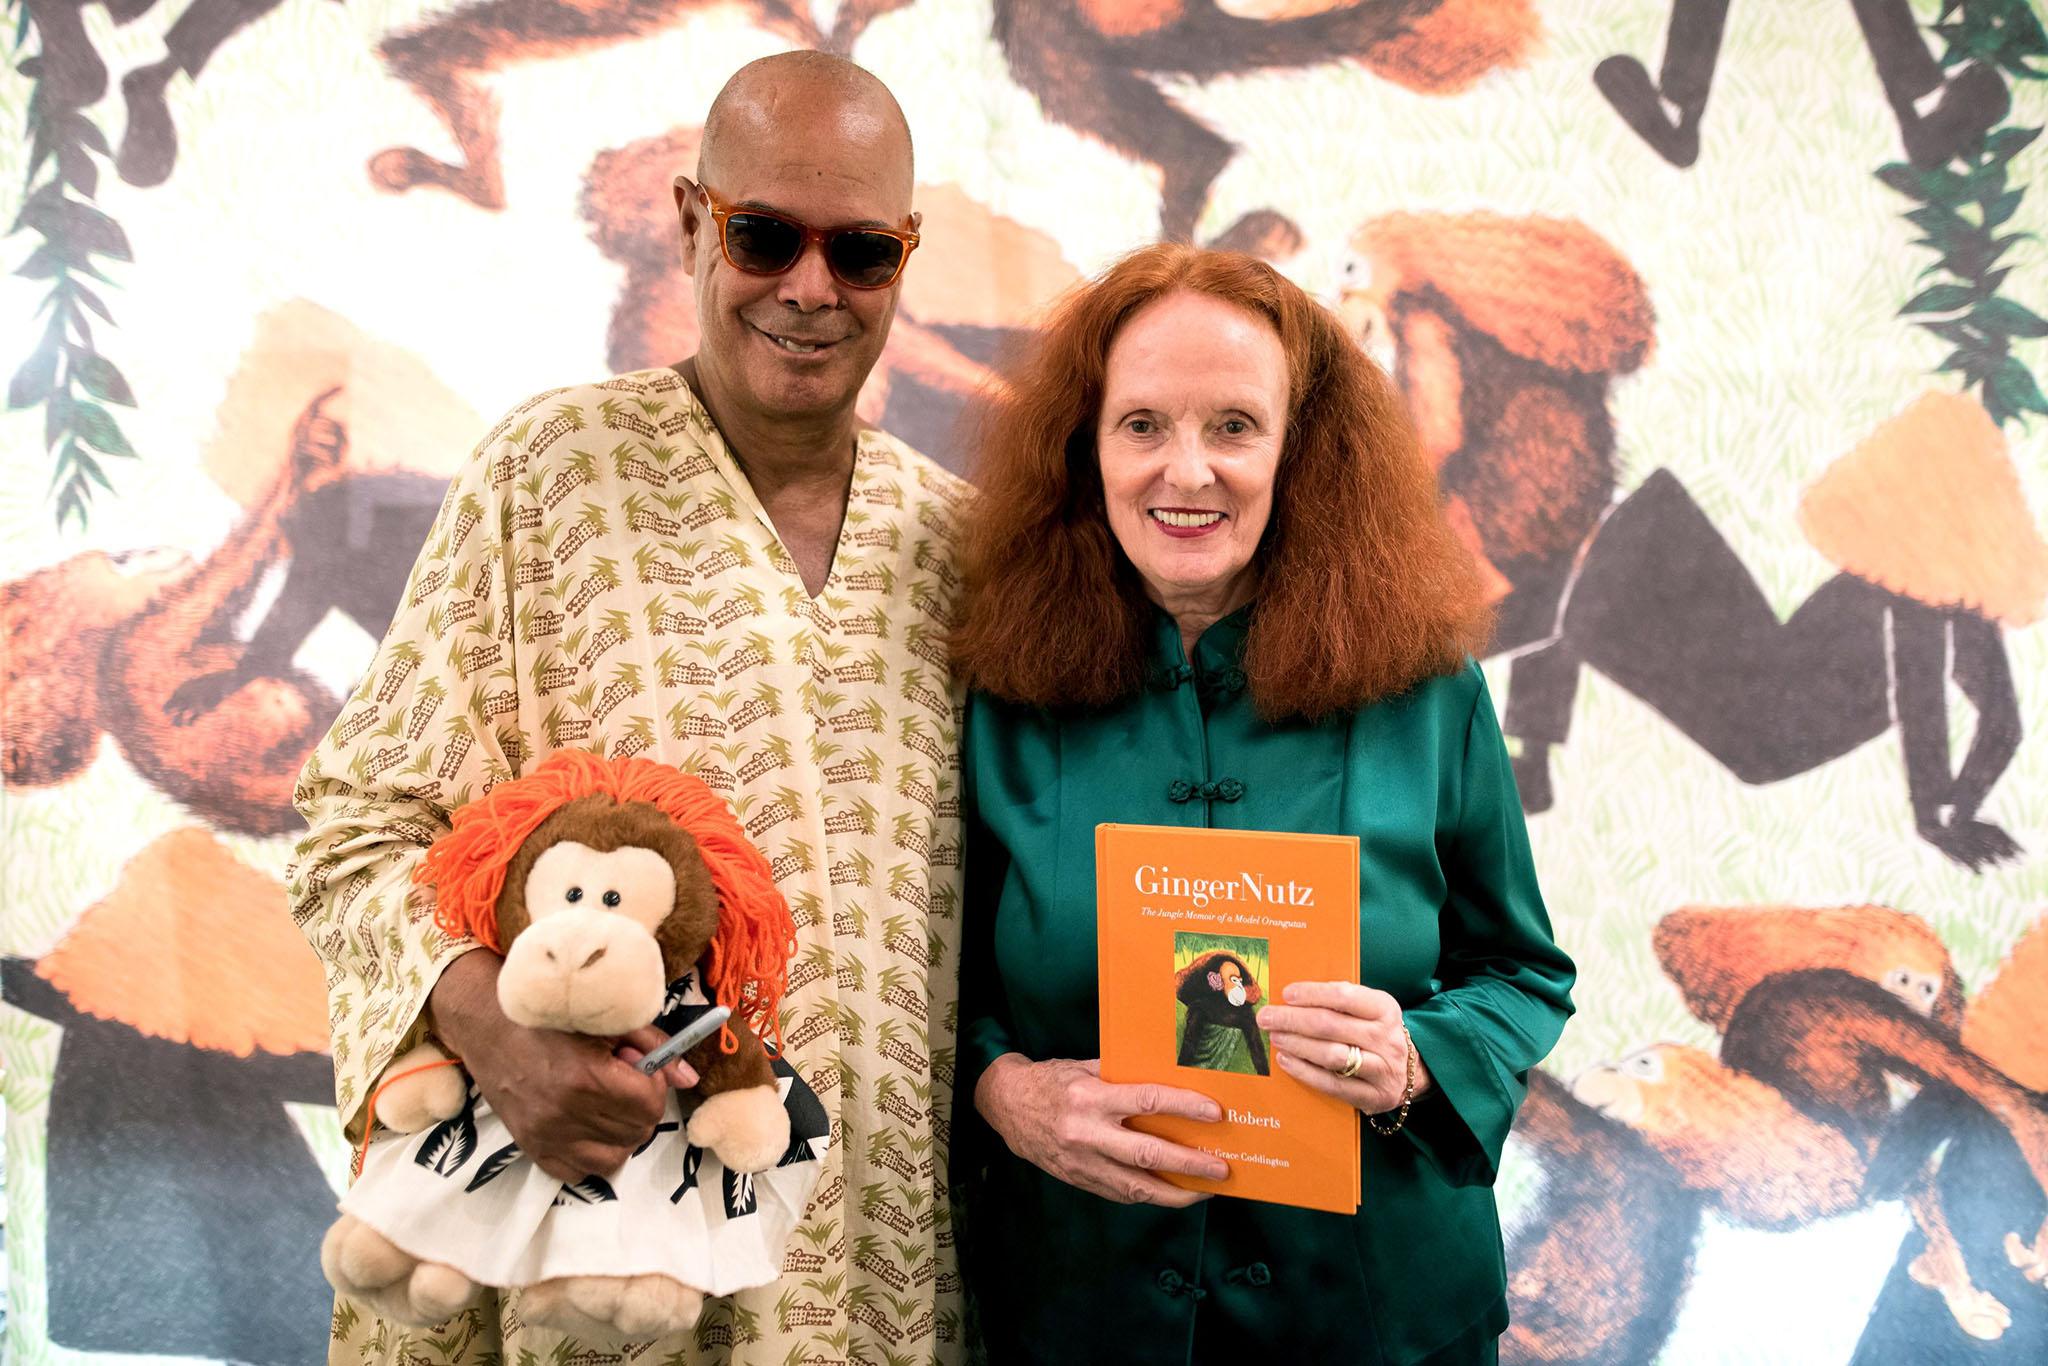 Michael Roberts, Grace CoddingtonGrace Coddington and Michael Roberts 'GingerNutz' book signing, The Met Store, New York, USA - 08 Sep 2017